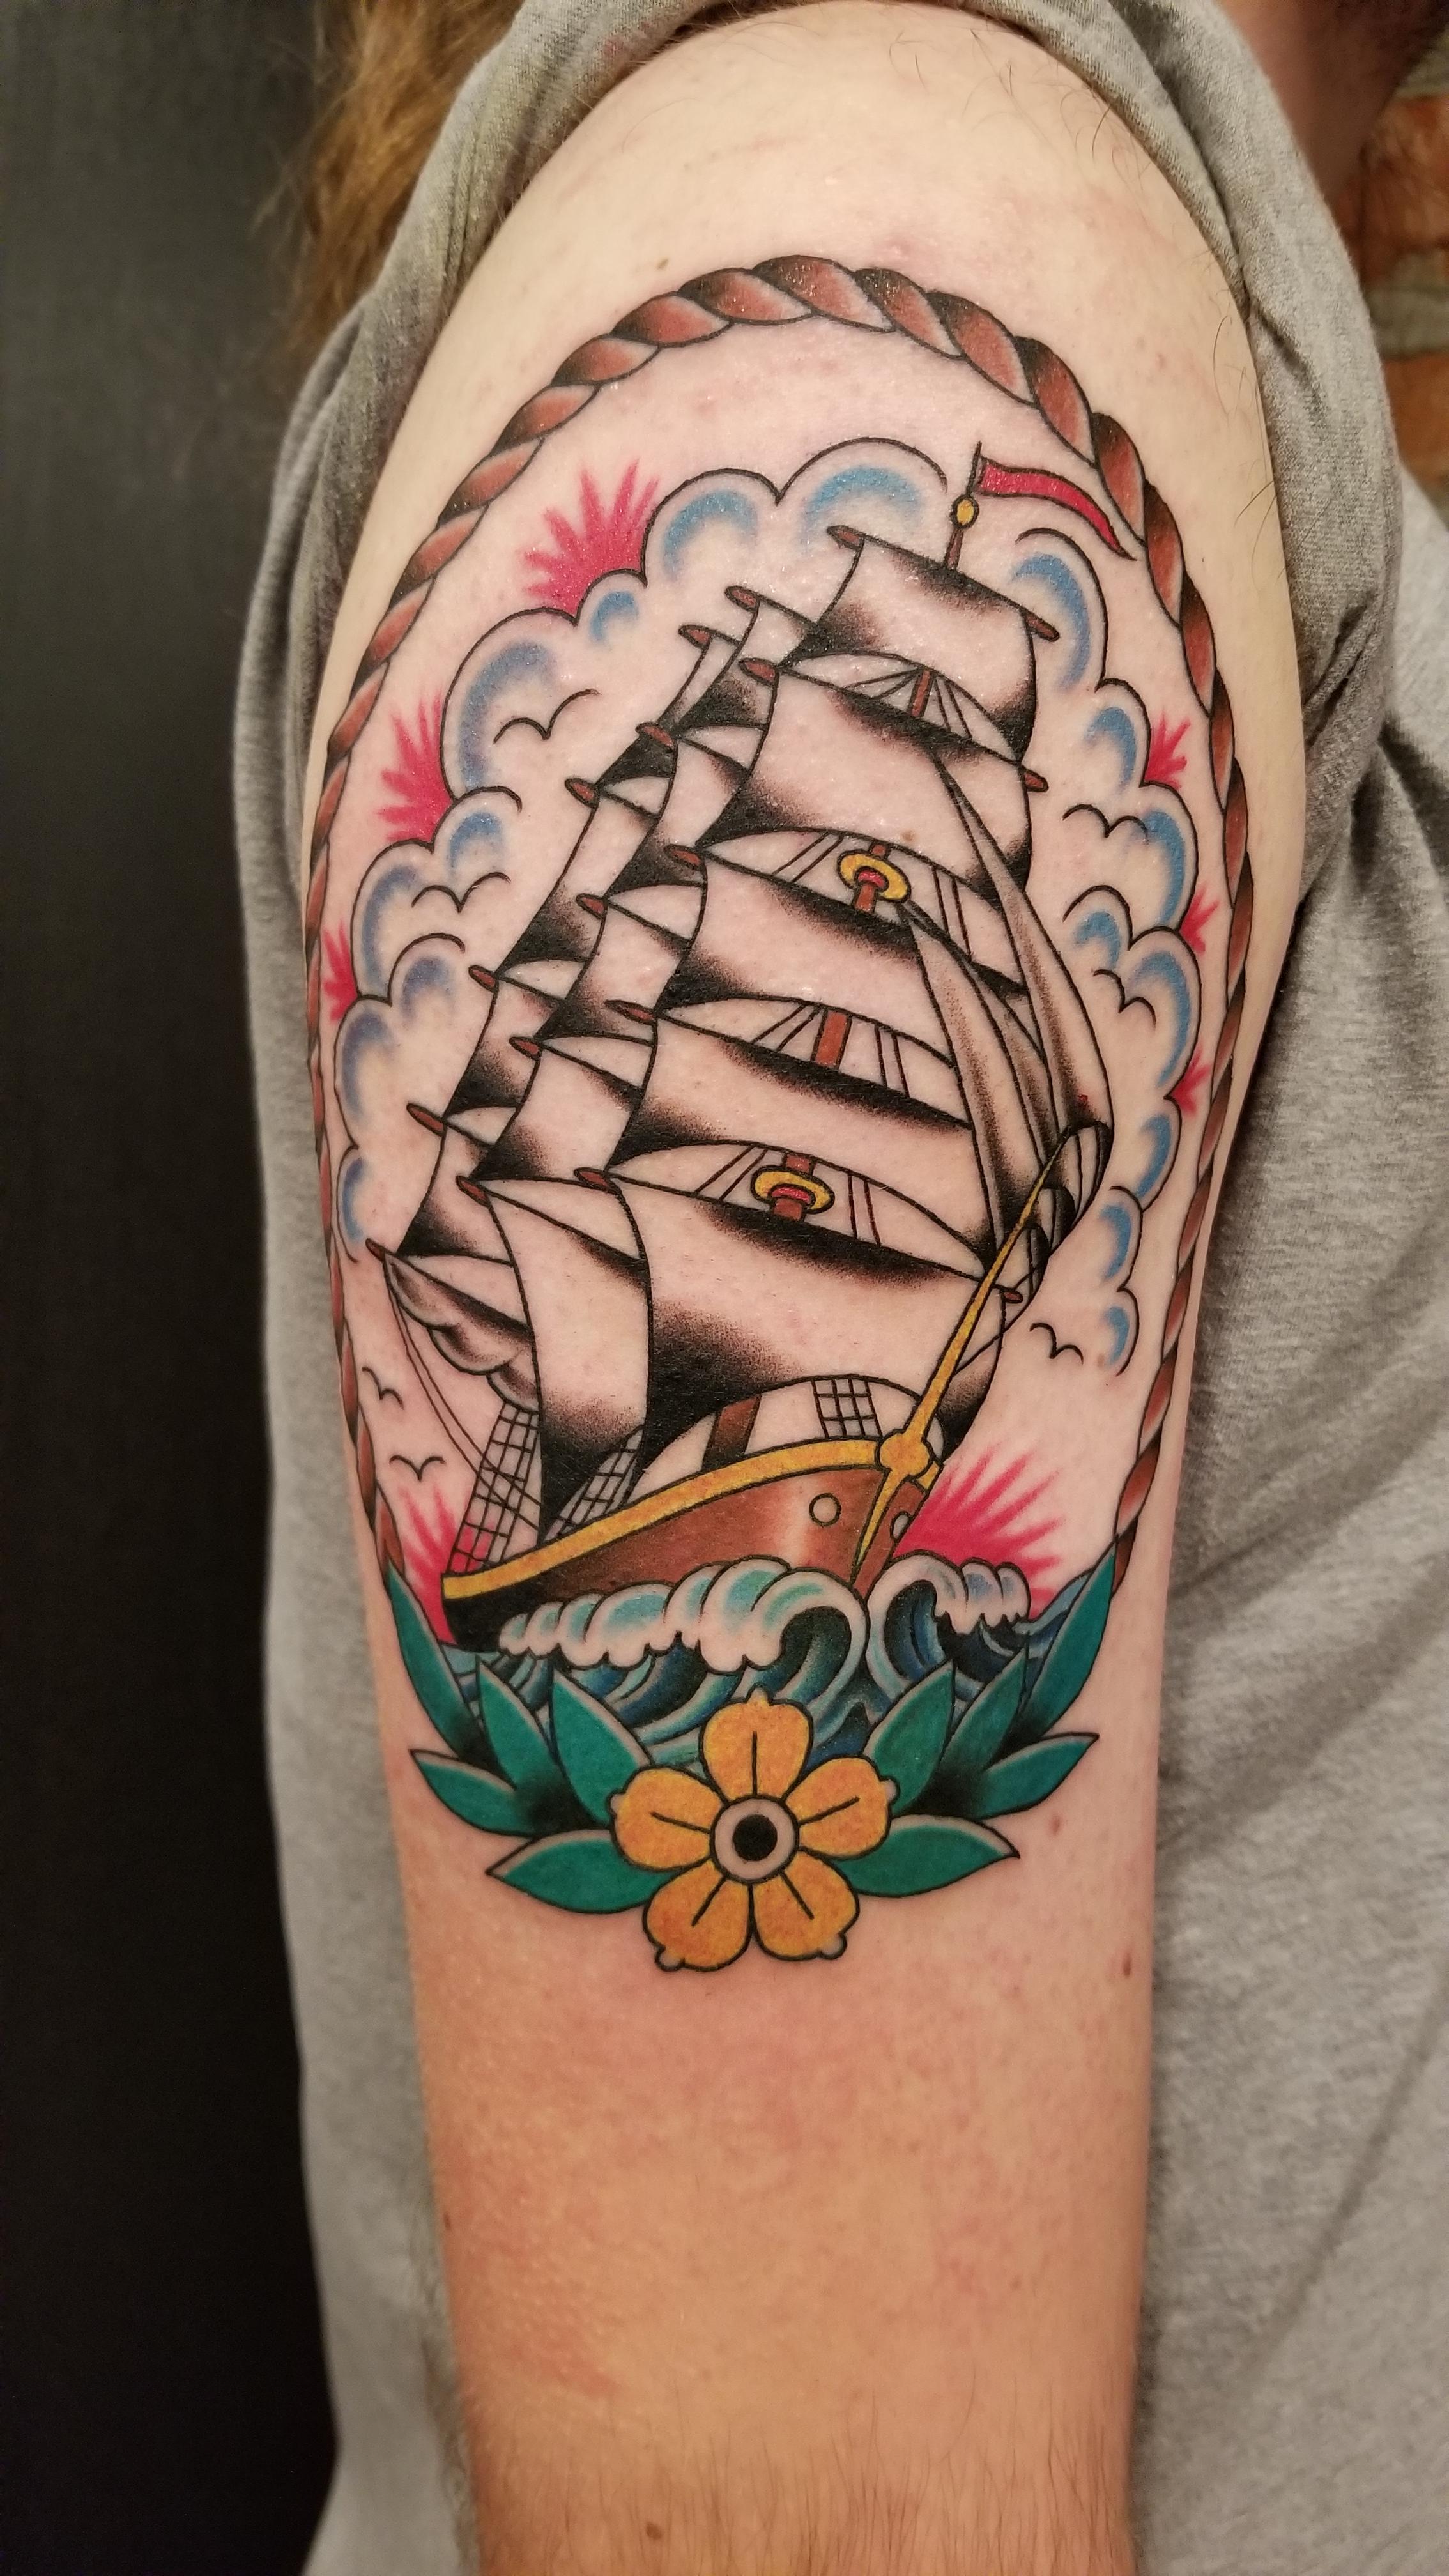 Eastern Pass Tattoo : eastern, tattoo, Jerry, Justin, Dunwoody, Eastern, Tattoo, Philadelphia,, Tattoos